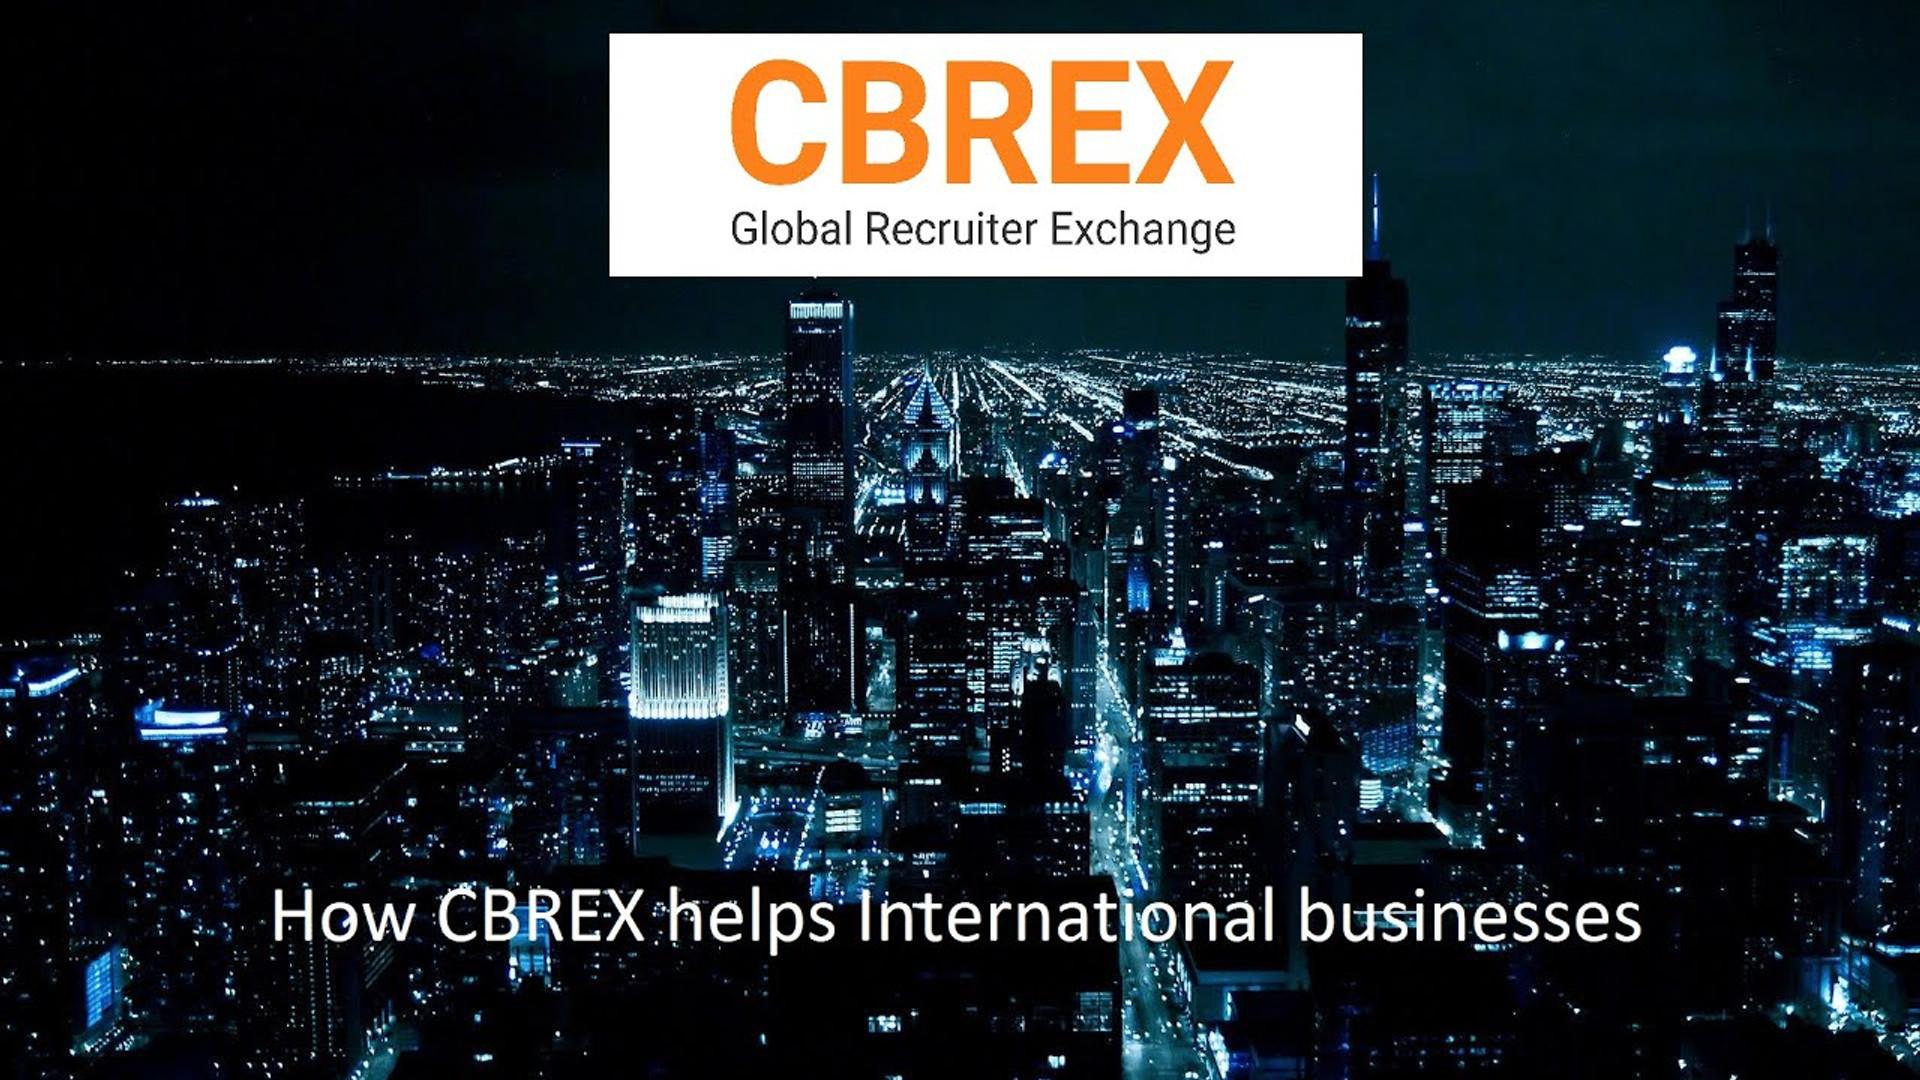 CBREX - Explainer Video